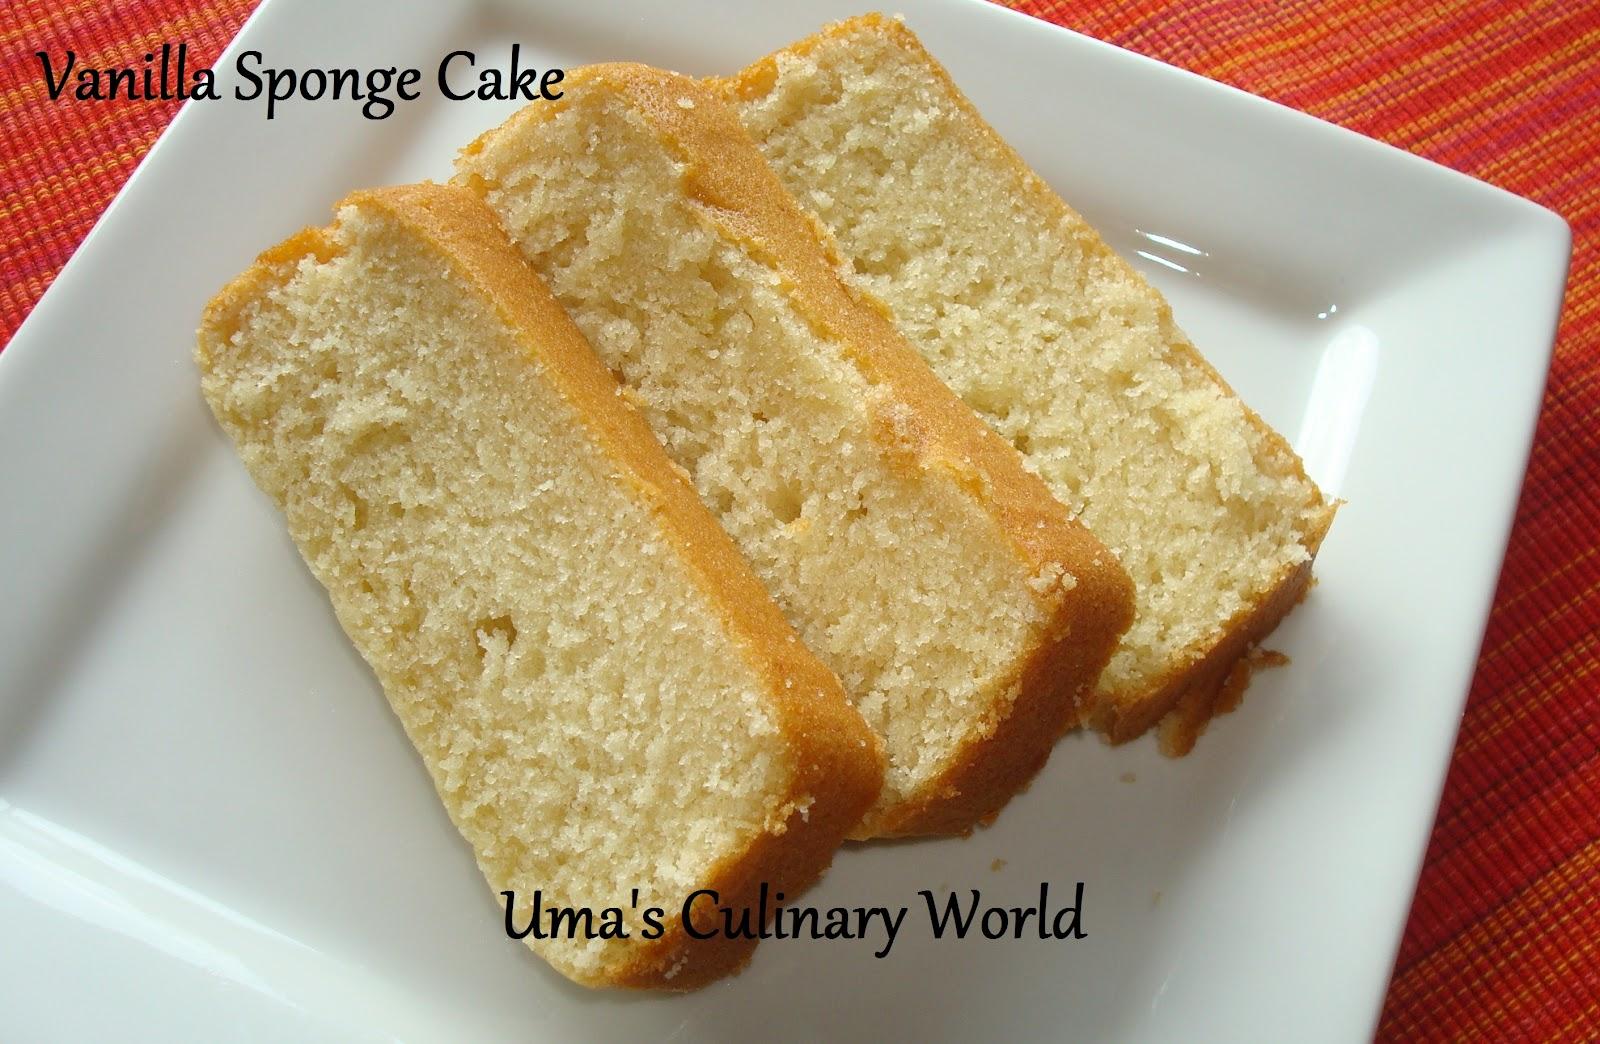 Uma's Culinary World: Eggless Sour Cream Vanilla Sponge Cake